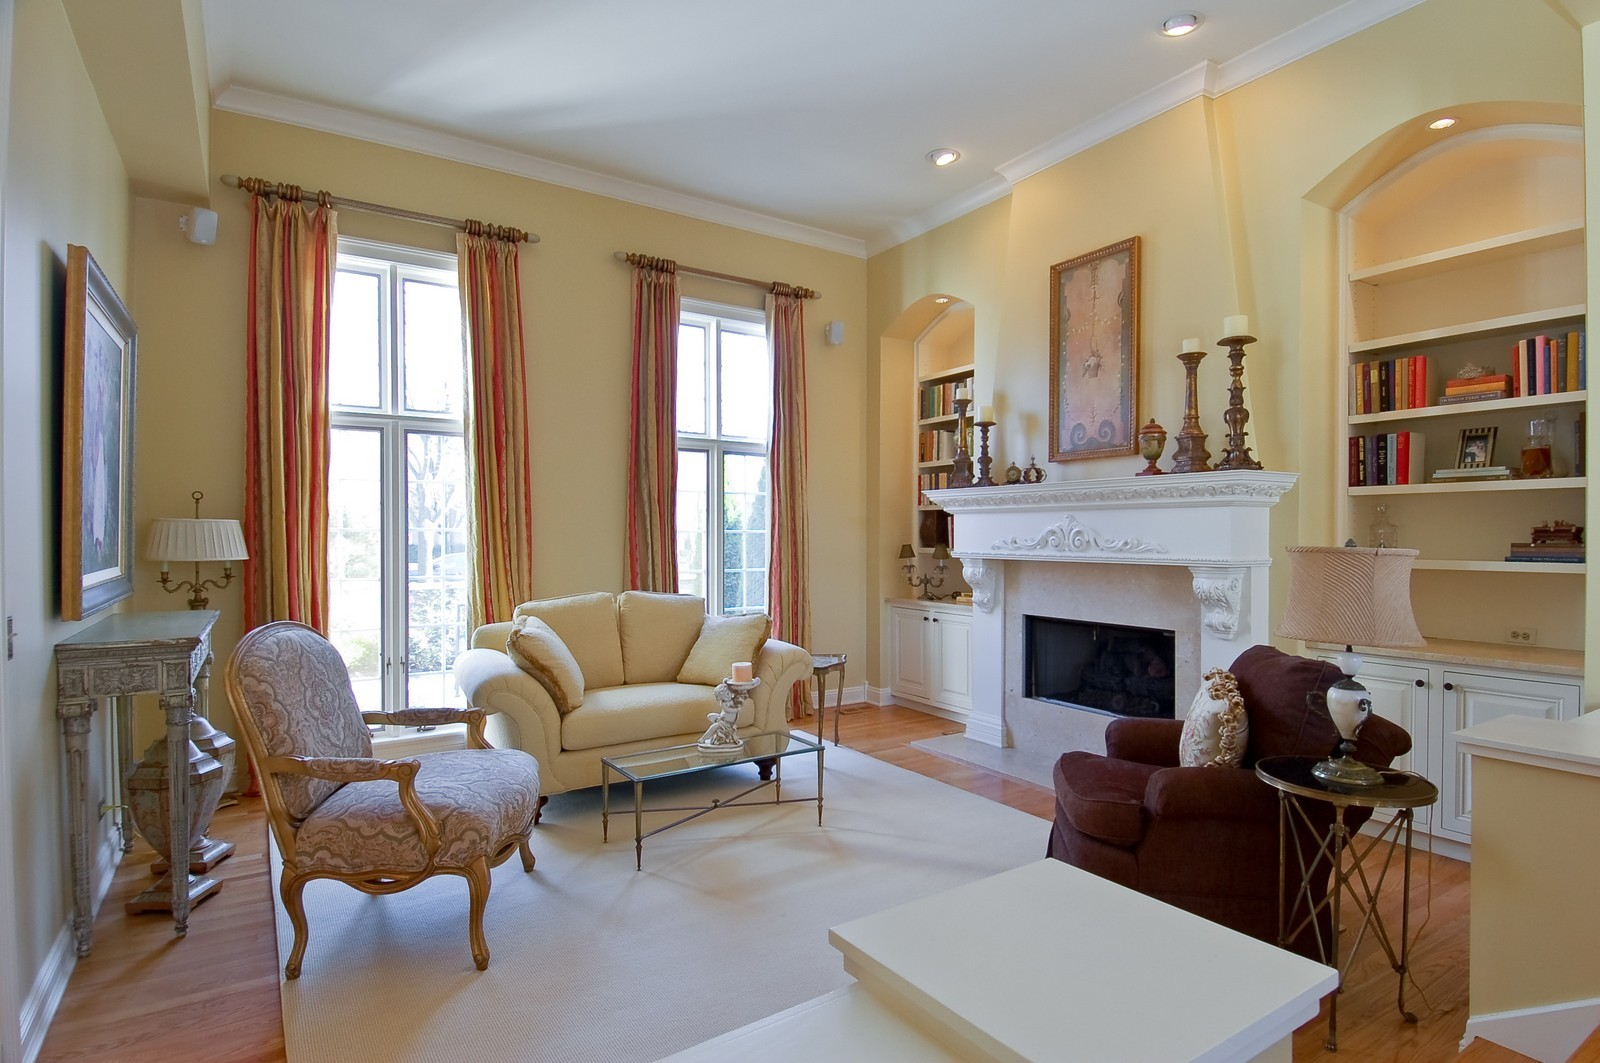 Real Estate Photography - 1492 Lloyd, Wheaton, IL, 60189 - Living Room